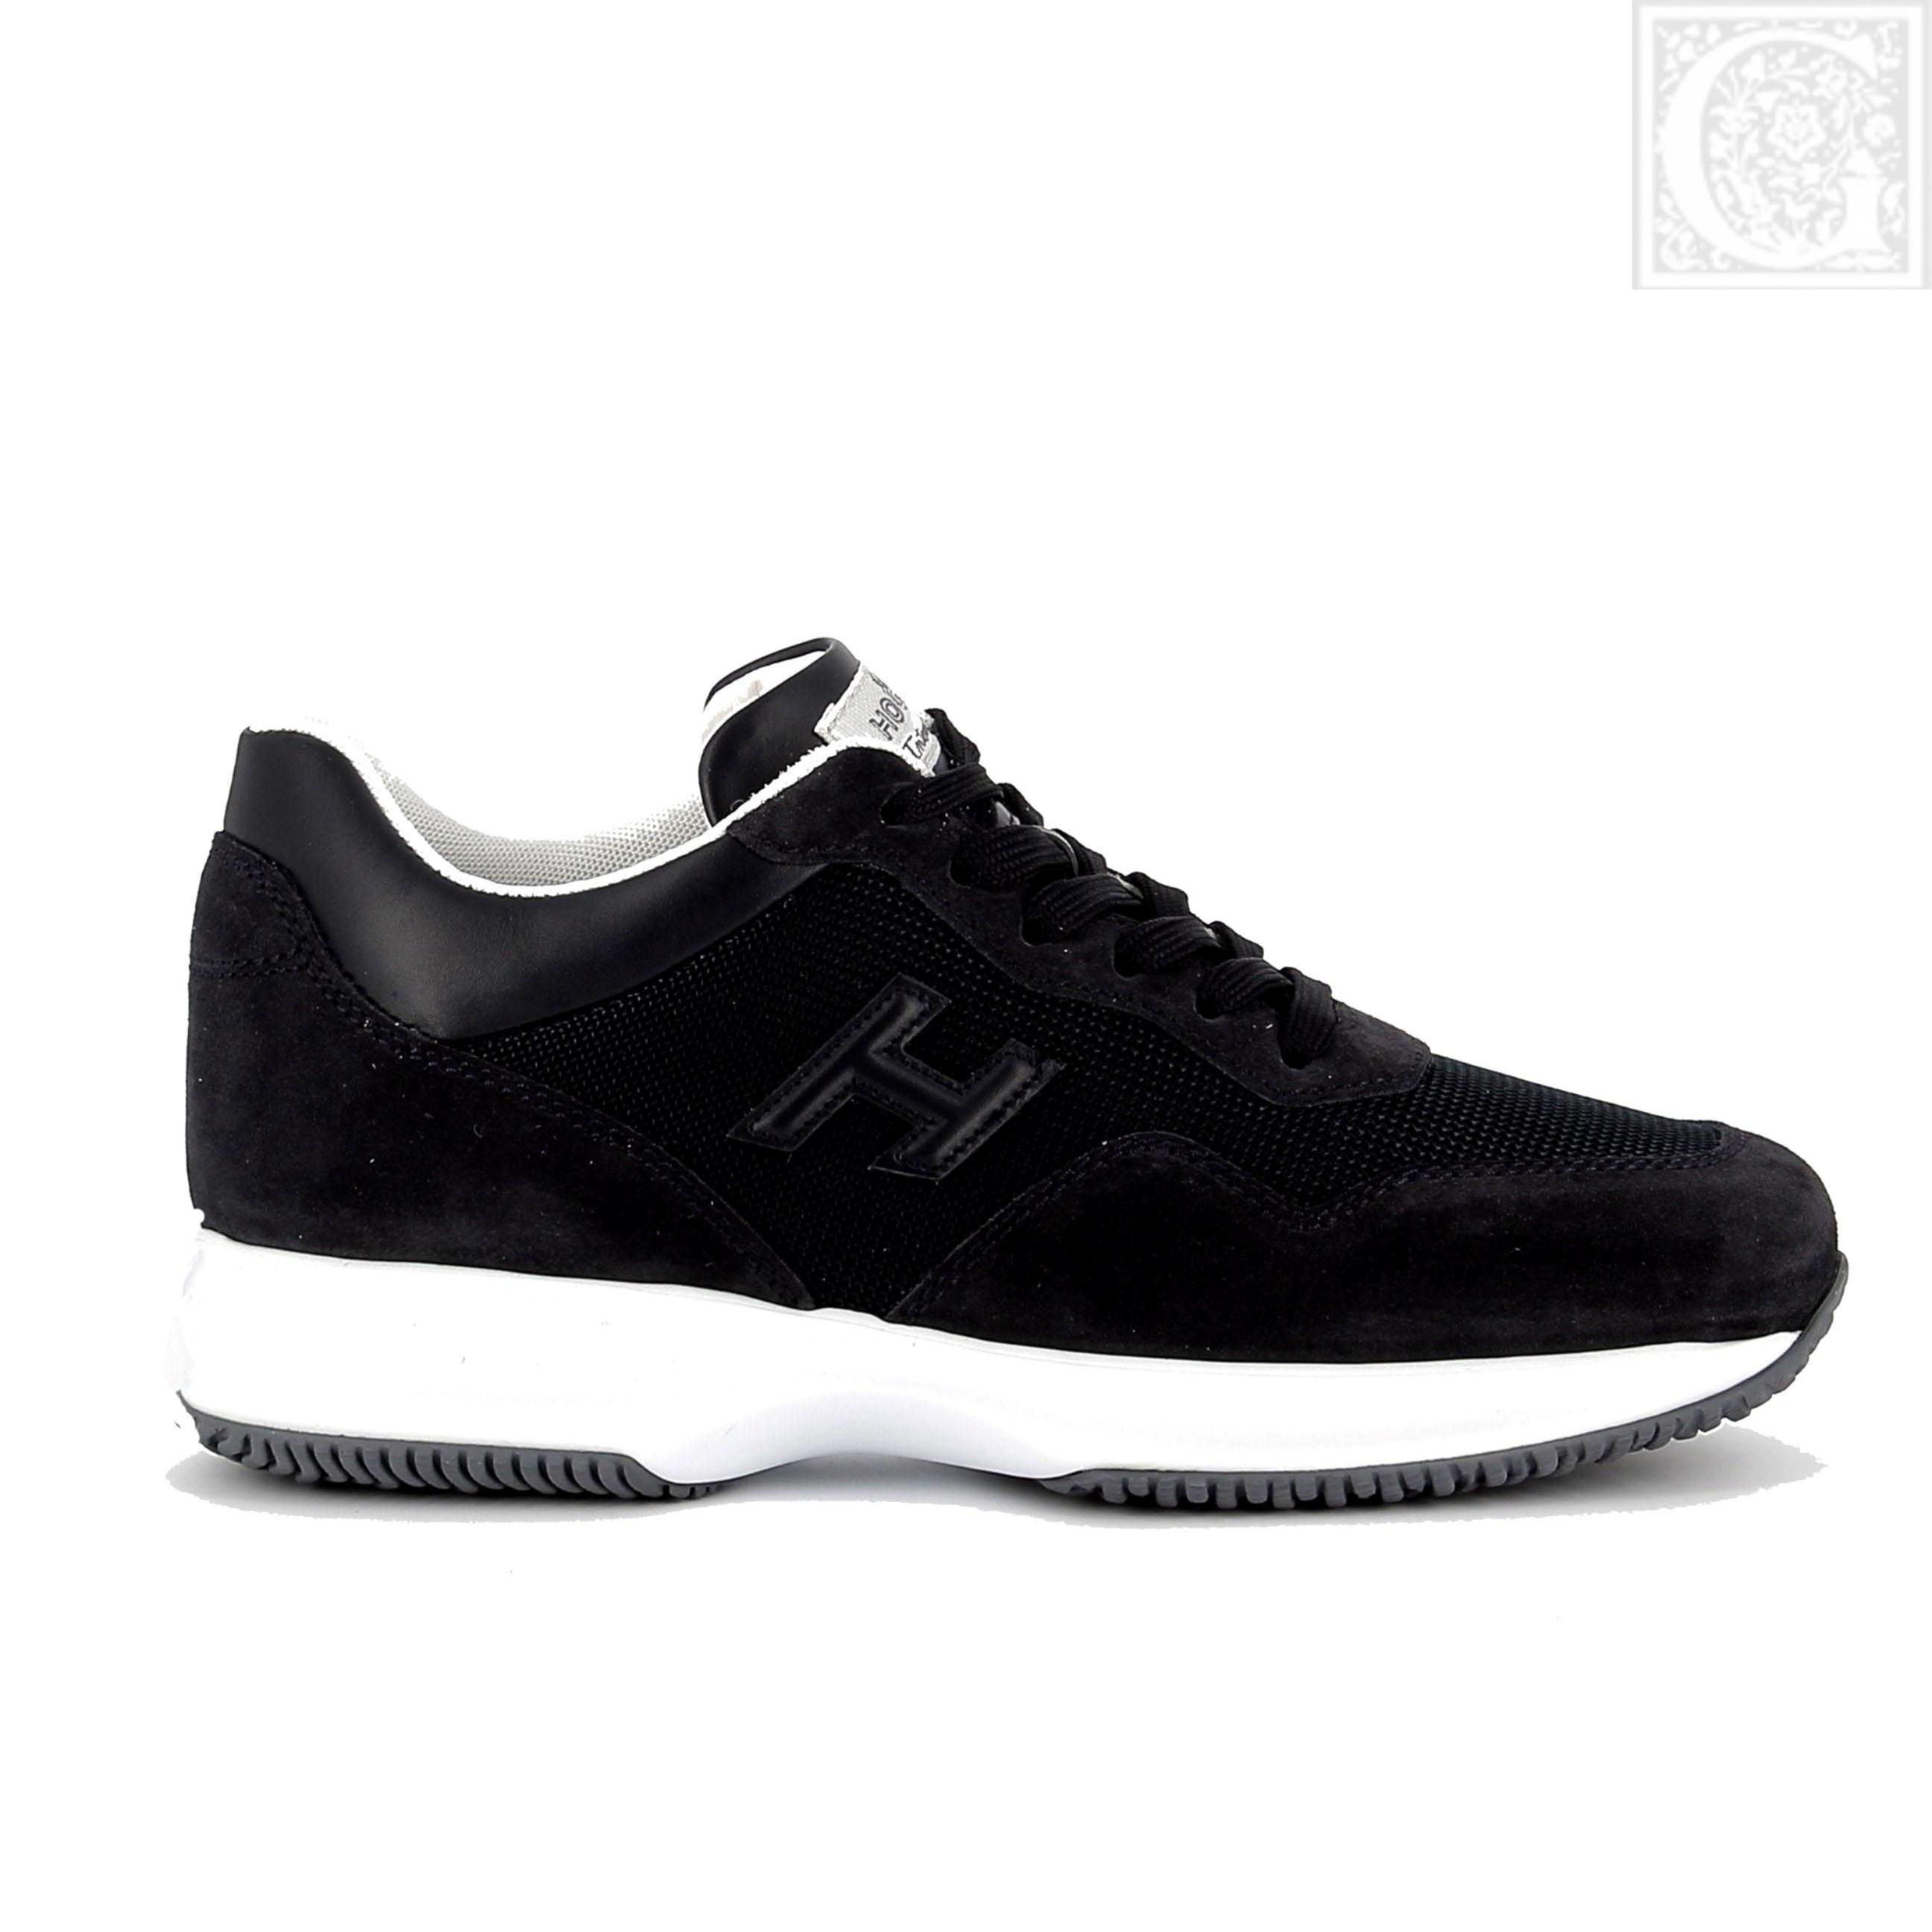 Sneaker 3D 8 9 5 H Hogan stringate Sneakers Interactive 5gHpxqU